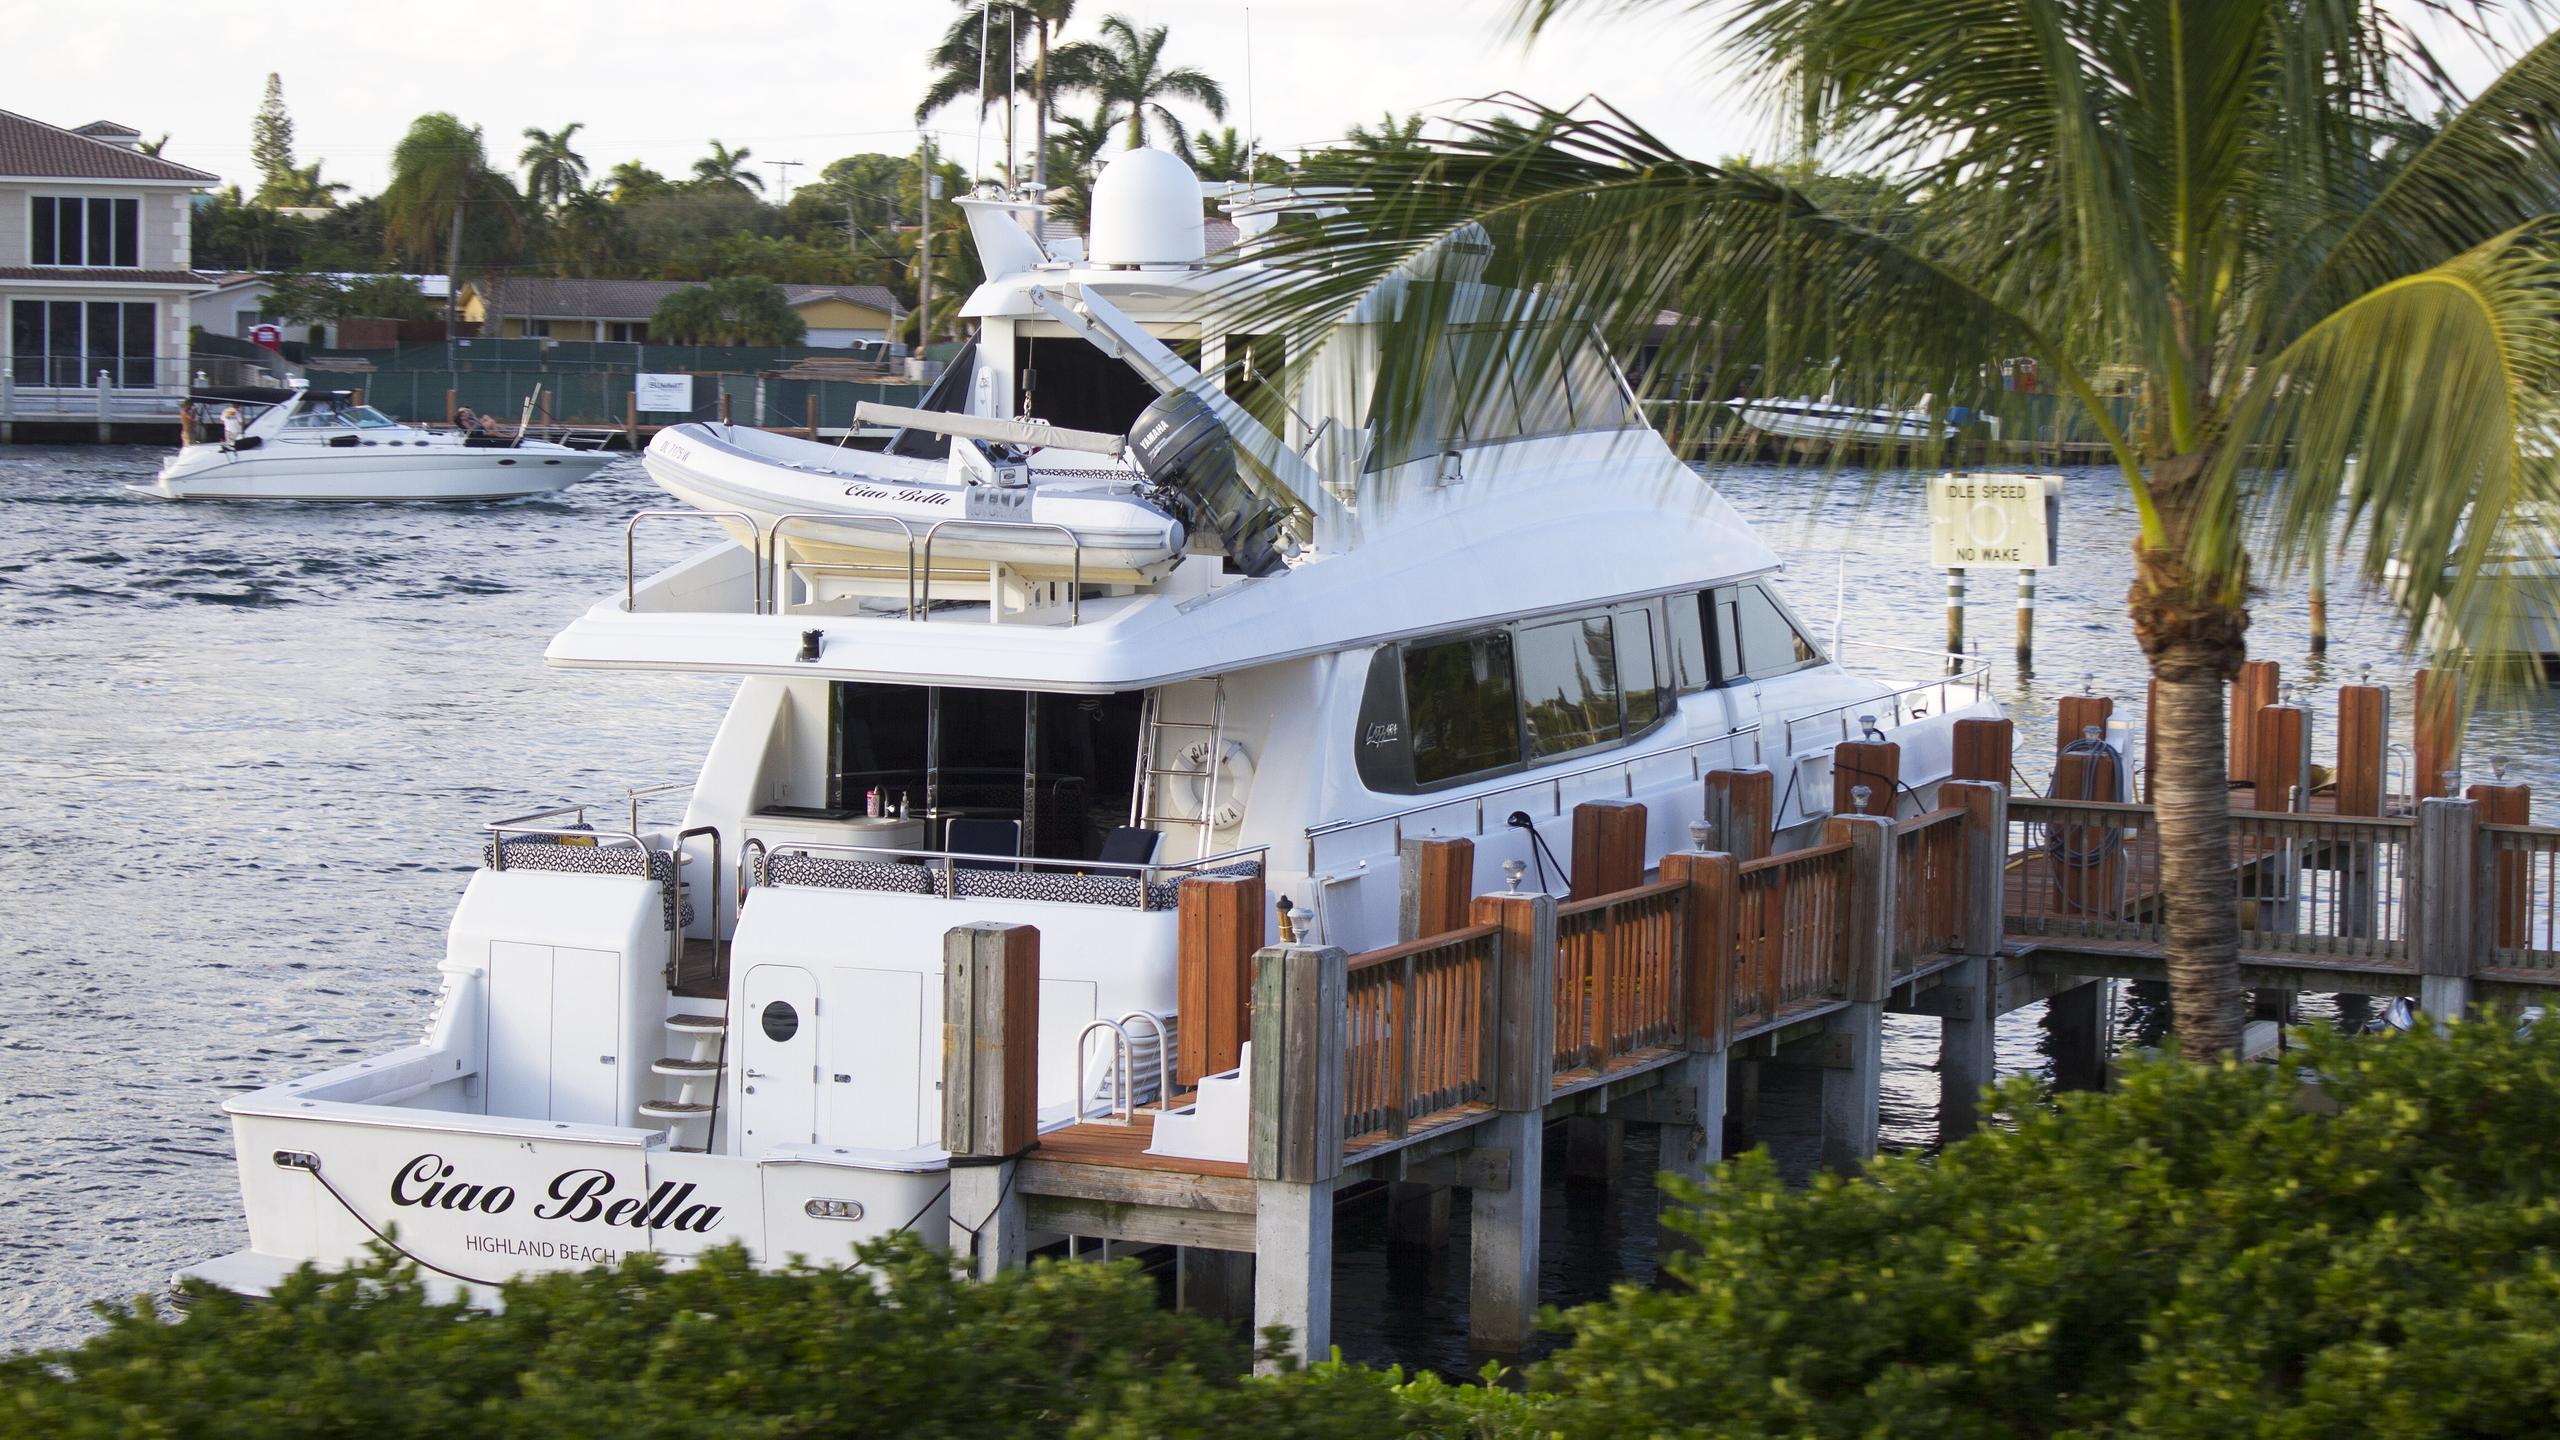 ciao-bella-motor-yacht-lazzara-80-sl-2001-25m-mooring